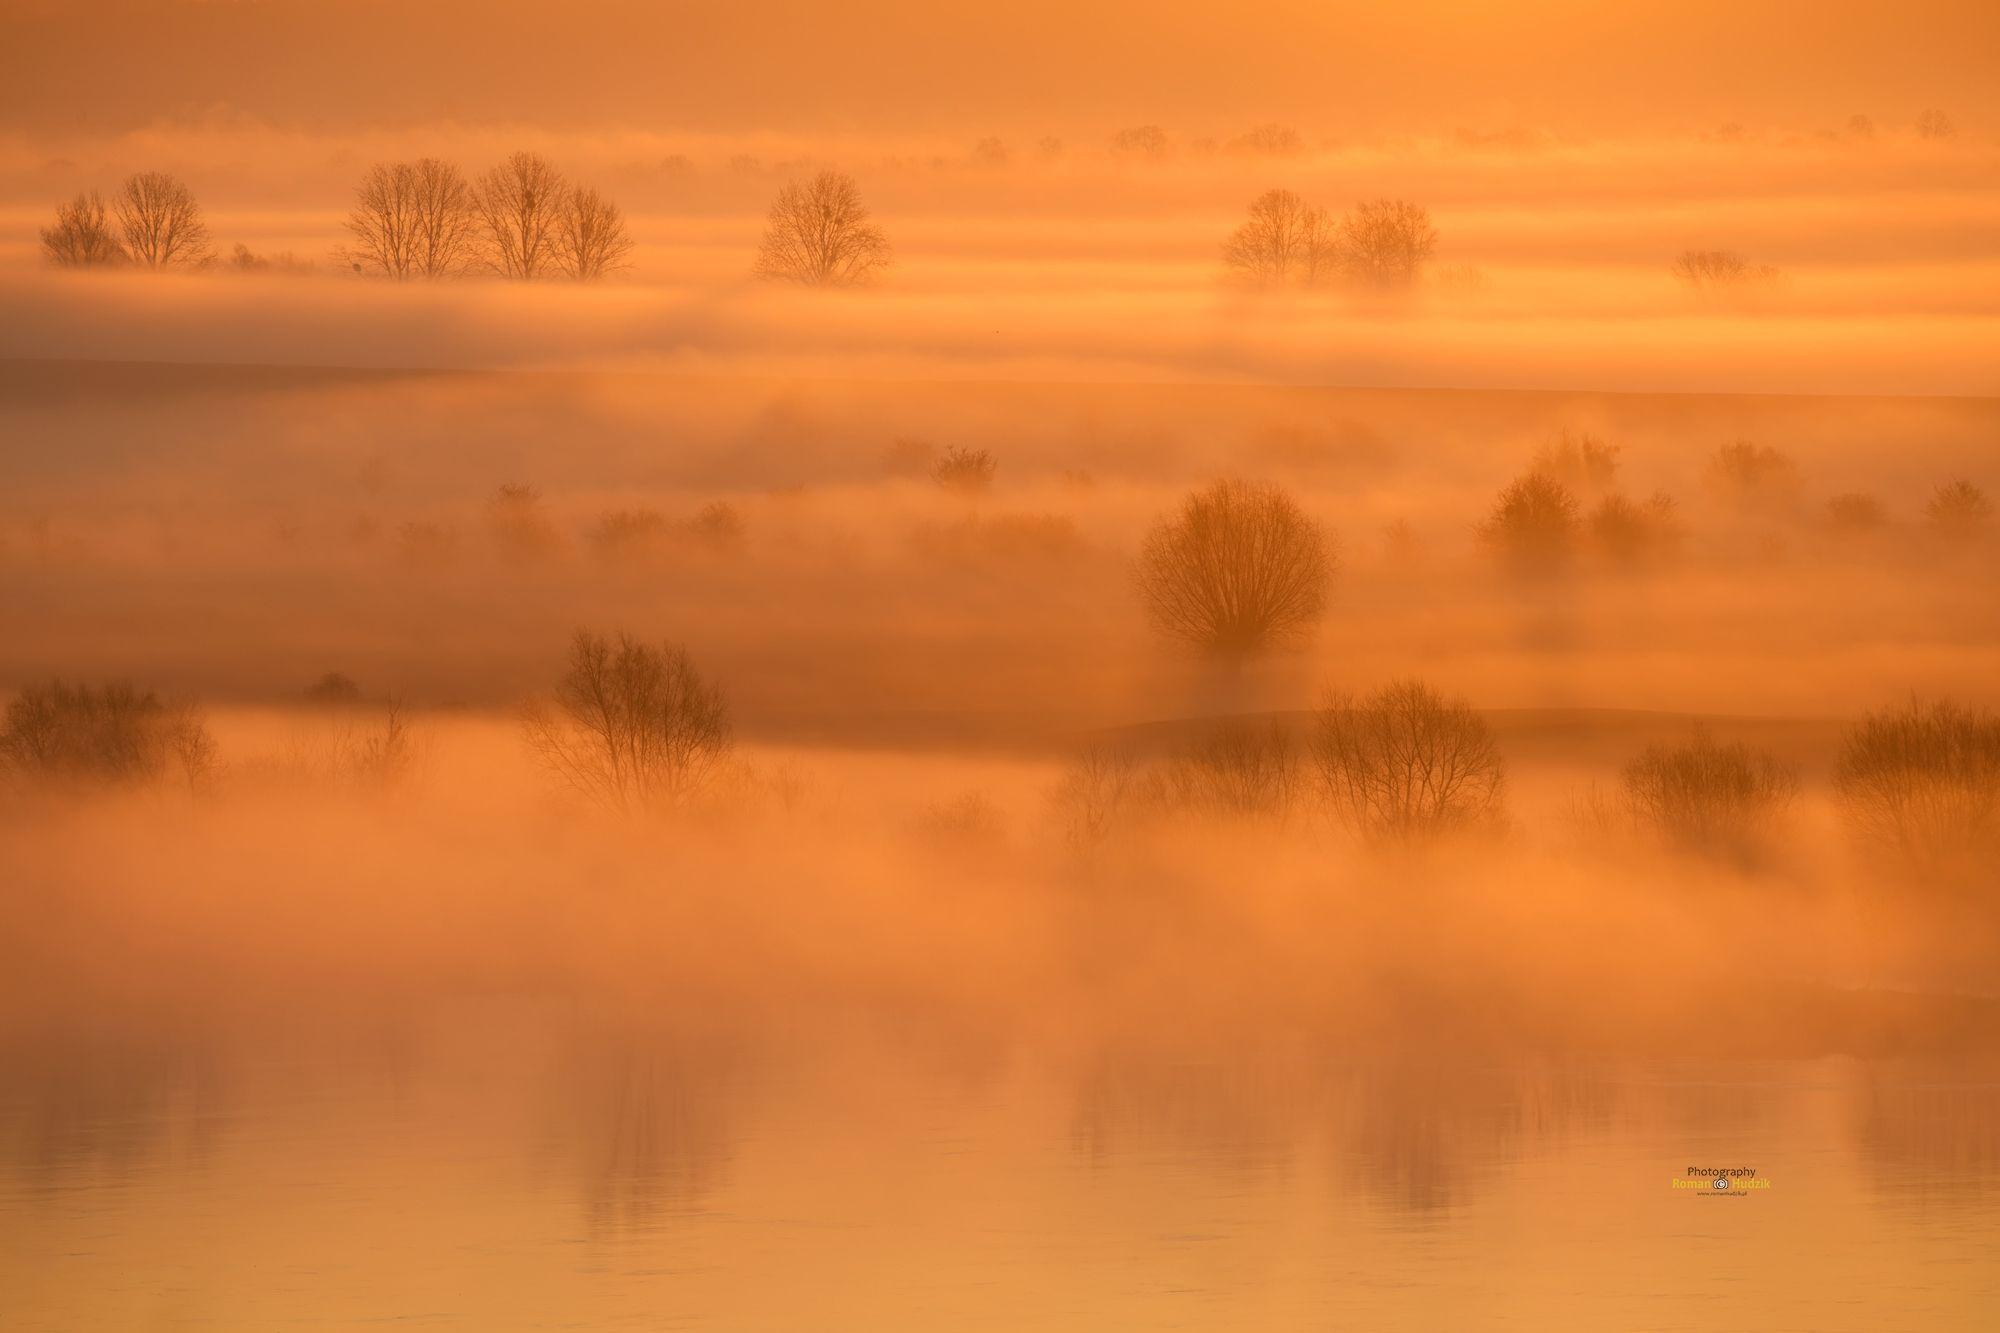 Misty morning, sunrise, fog, landscape, colors of sunrise, trees, orange, Hudzik Roman